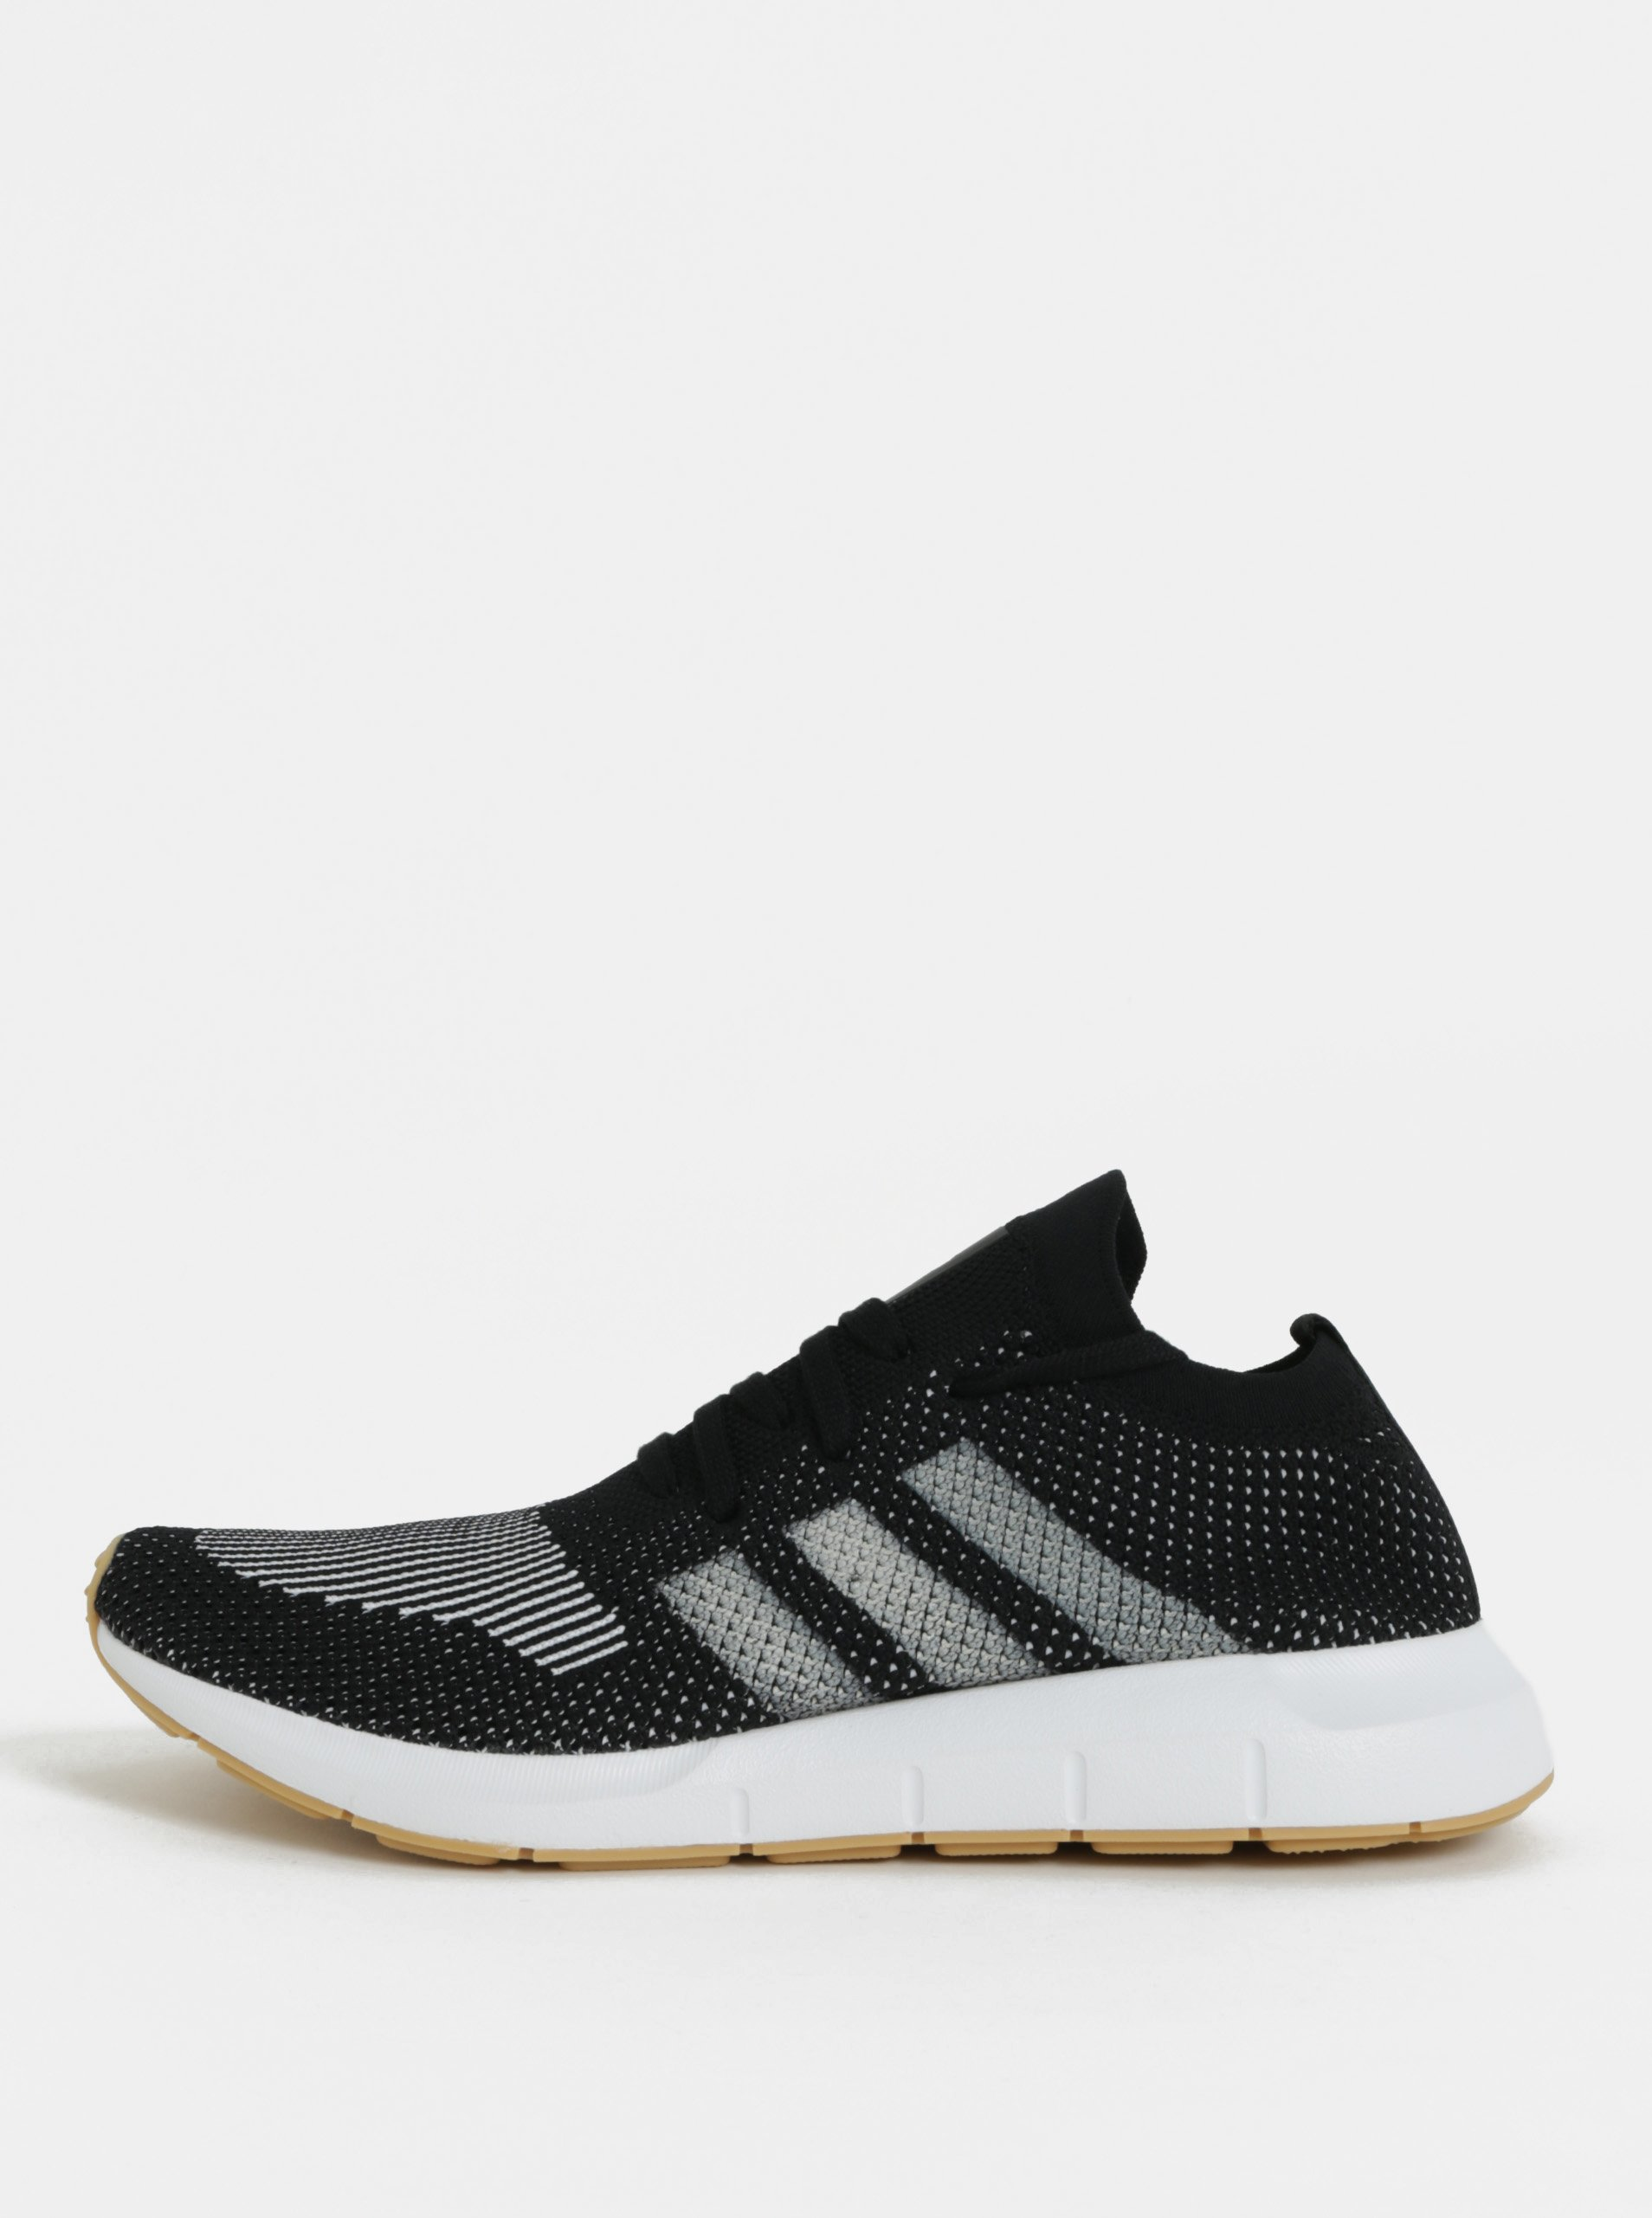 Bielo-čierne pánske tenisky adidas Originals Swift Run PK